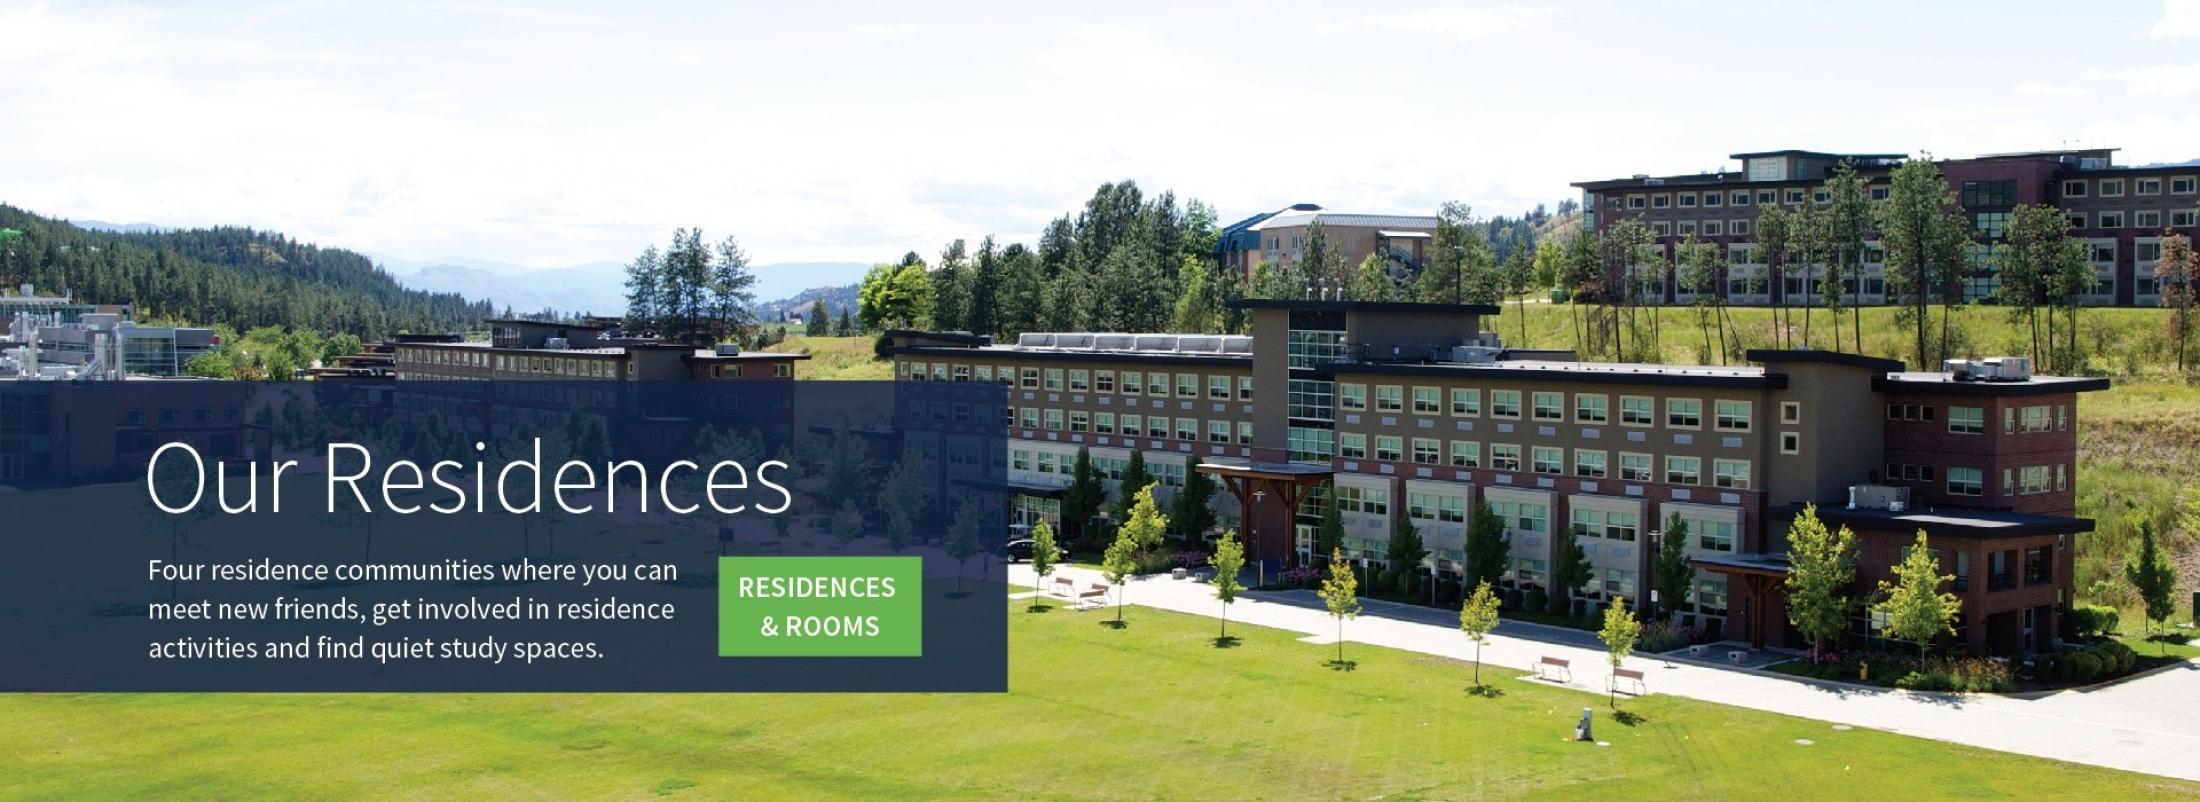 slide_homepage_residences